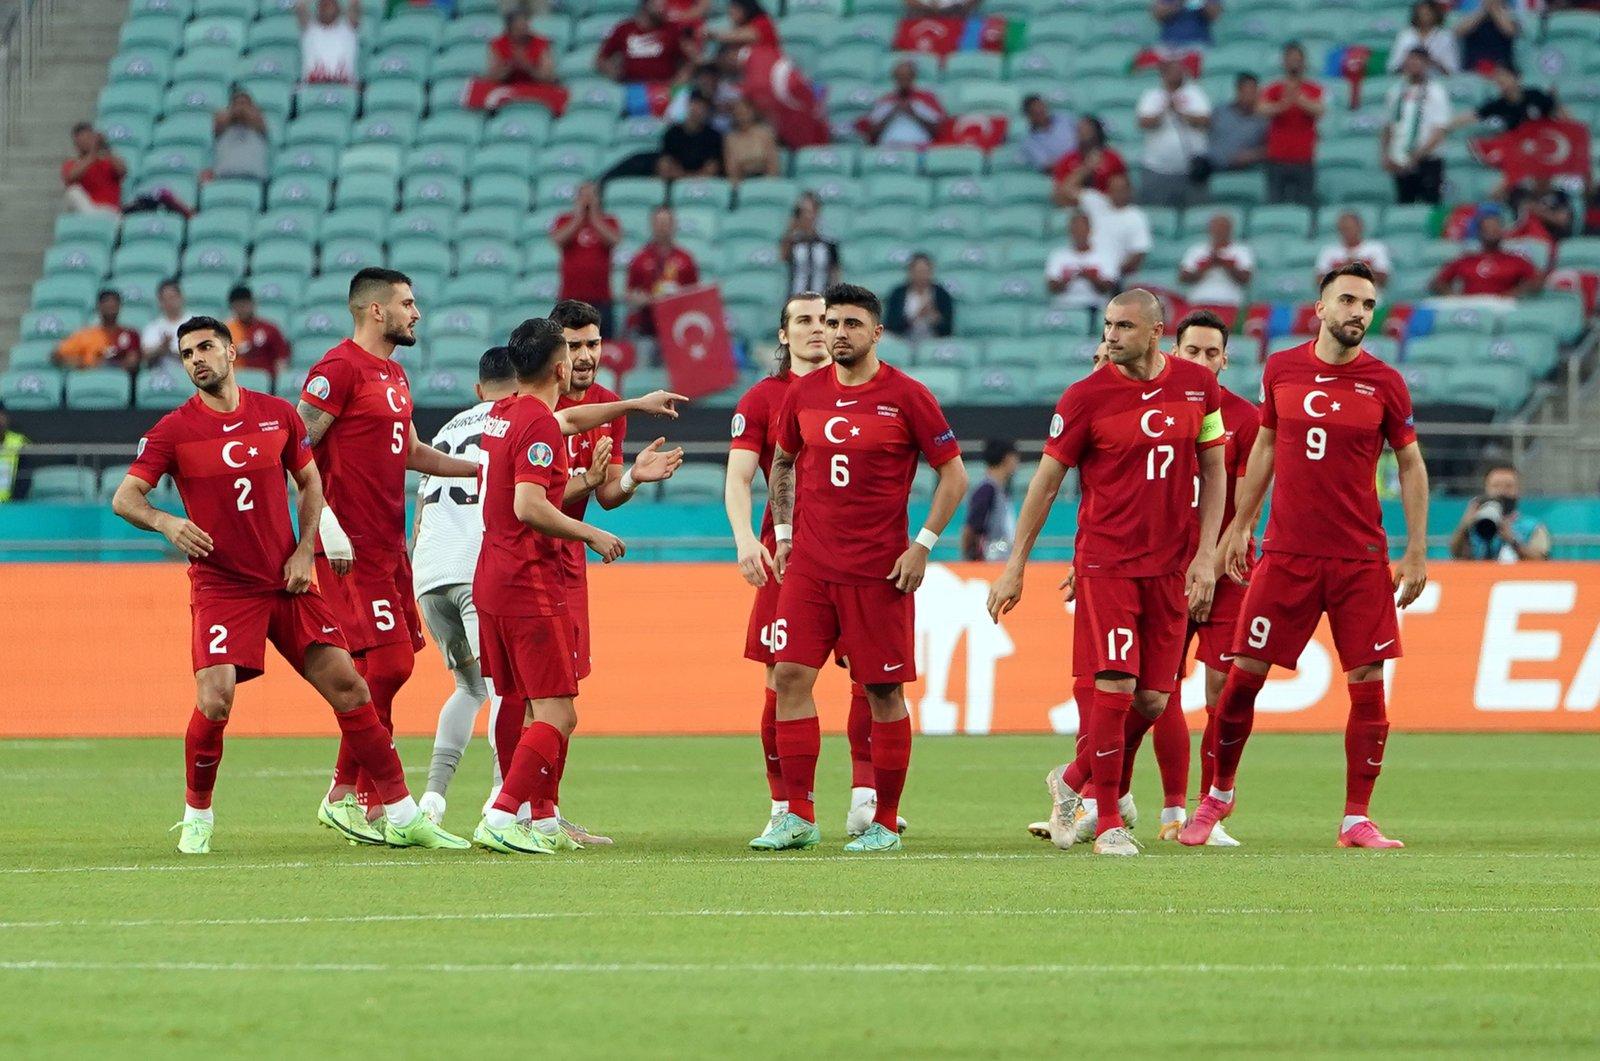 Turkish national players react during their Euro 2020 Group A match against Wales in Baku, Azerbaijan, June 16, 2021. (IHA Photo)